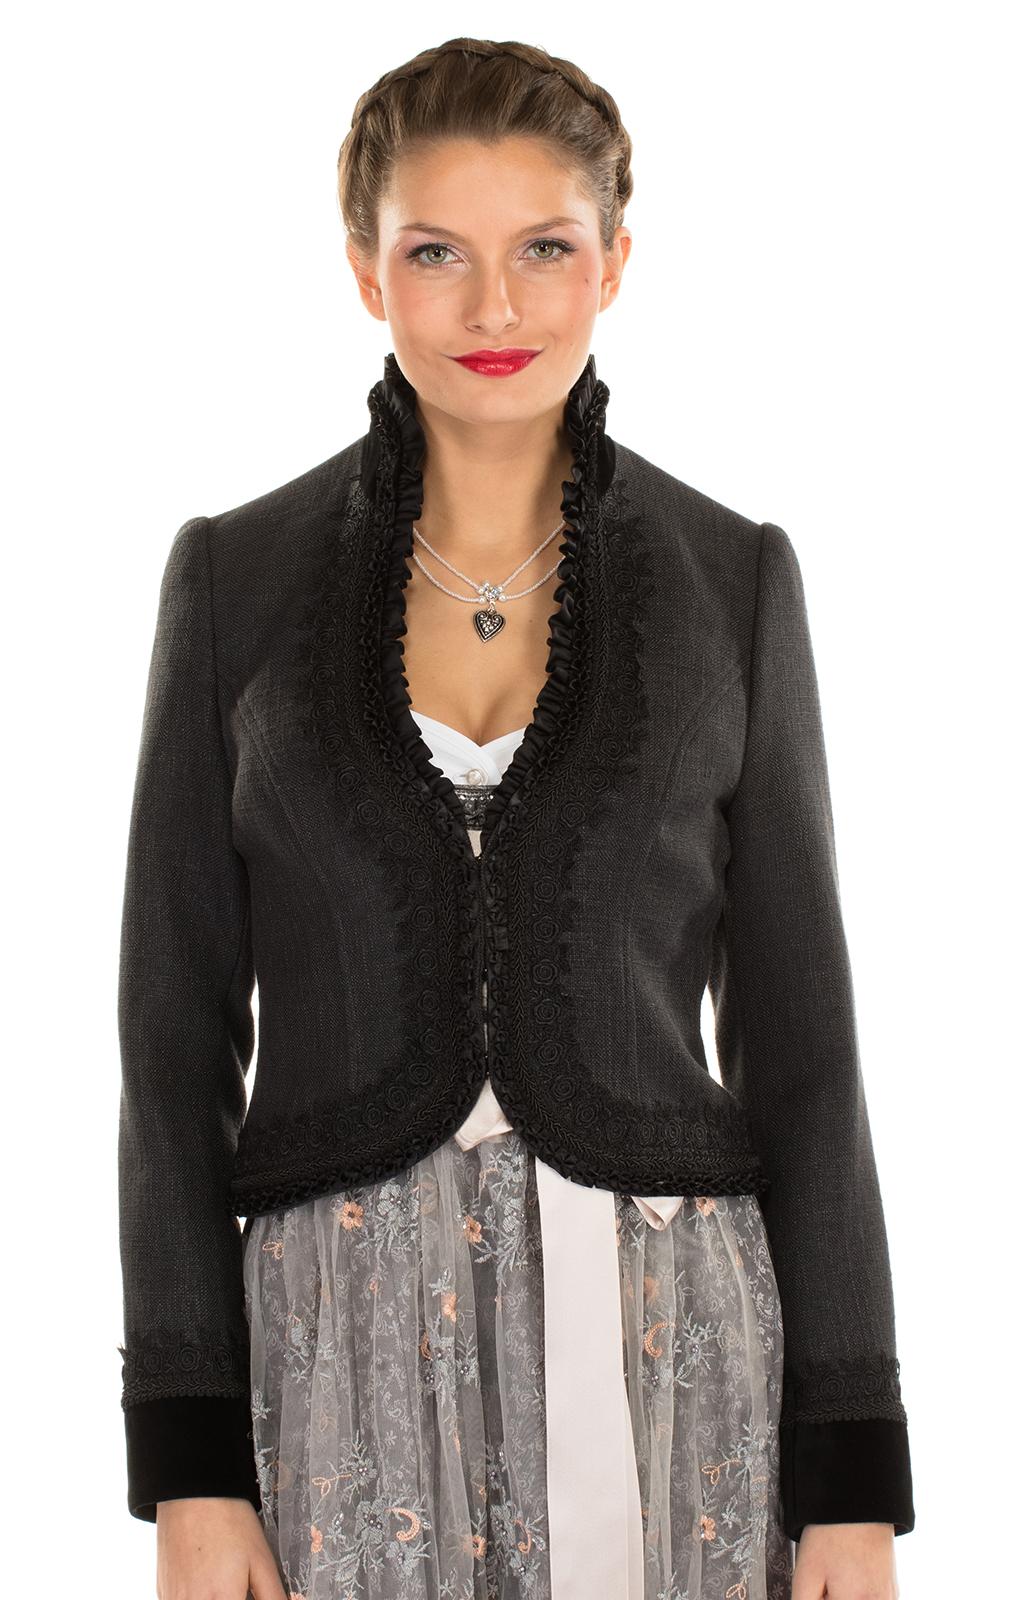 Traditional Jacket CHARMING black von Krüger Dirndl